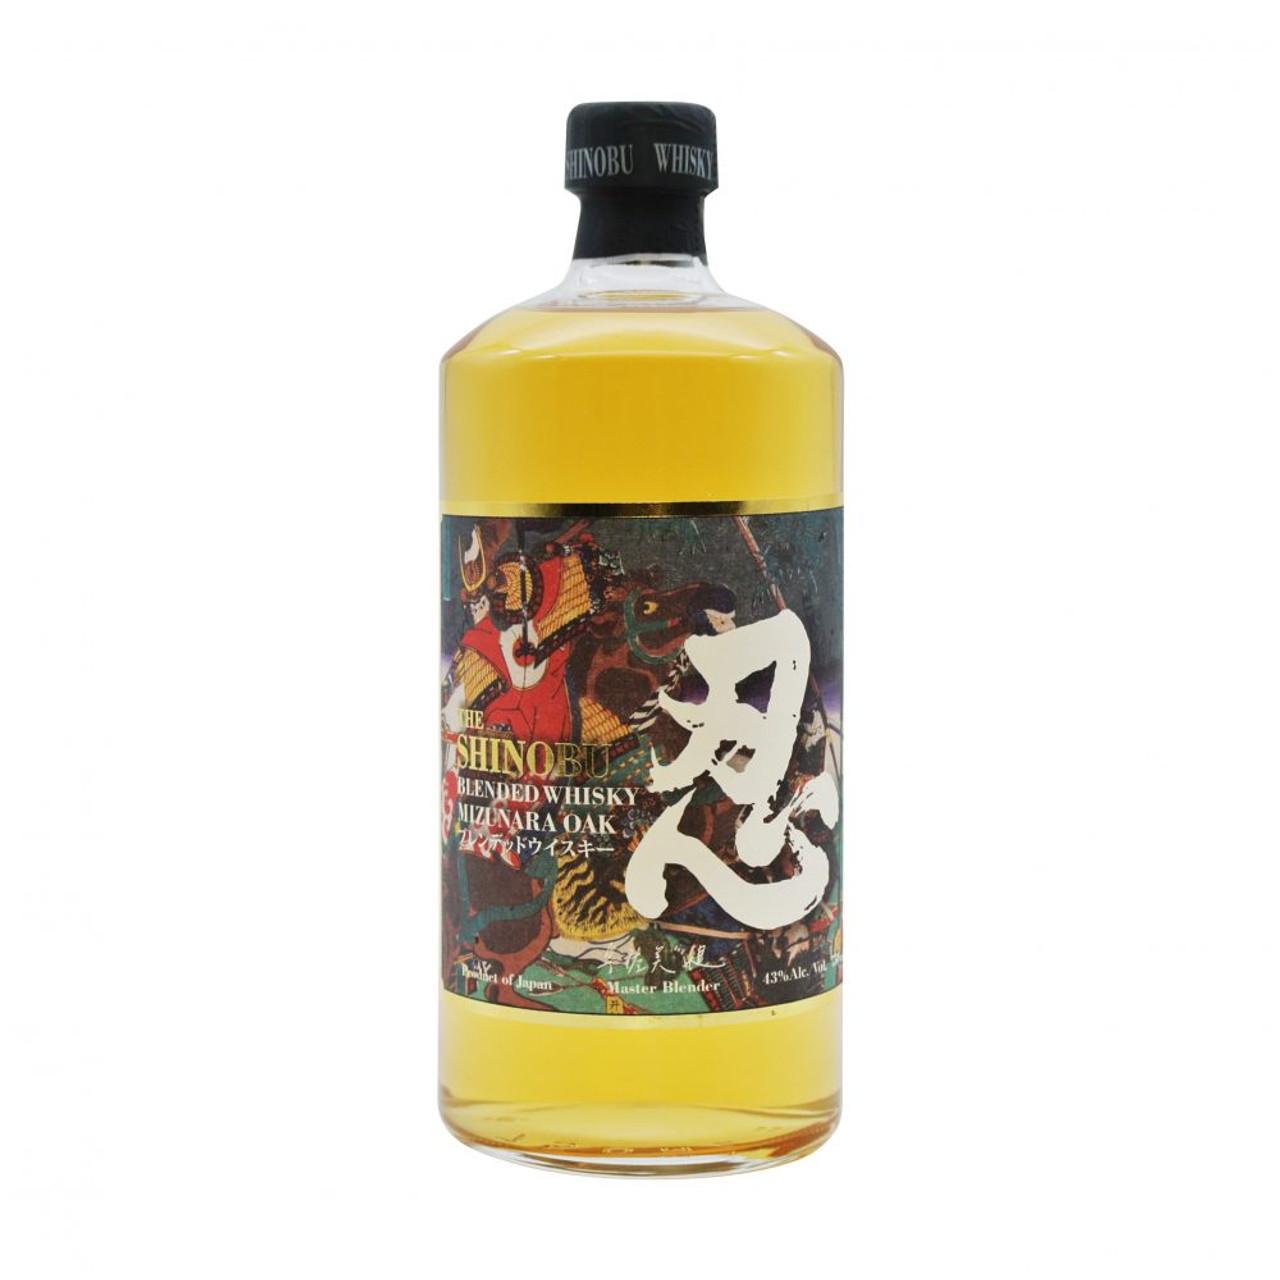 Shinobu Mizunara Oak Finish Blended Japanese Whisky 750ml